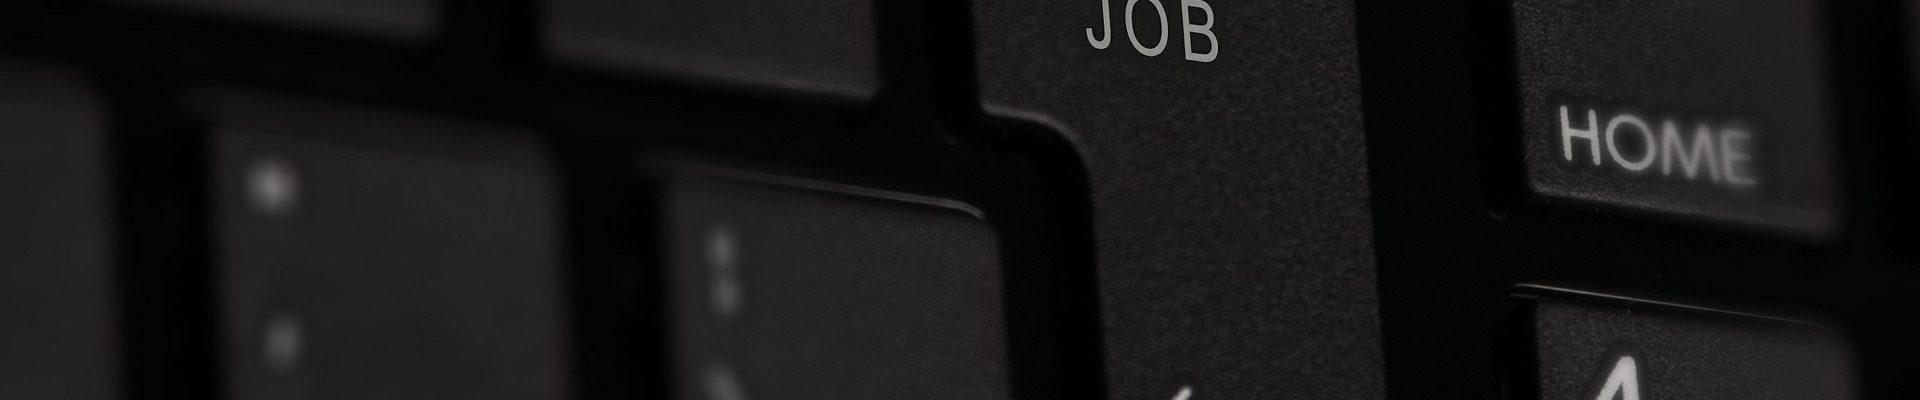 keyboard-417090_1920